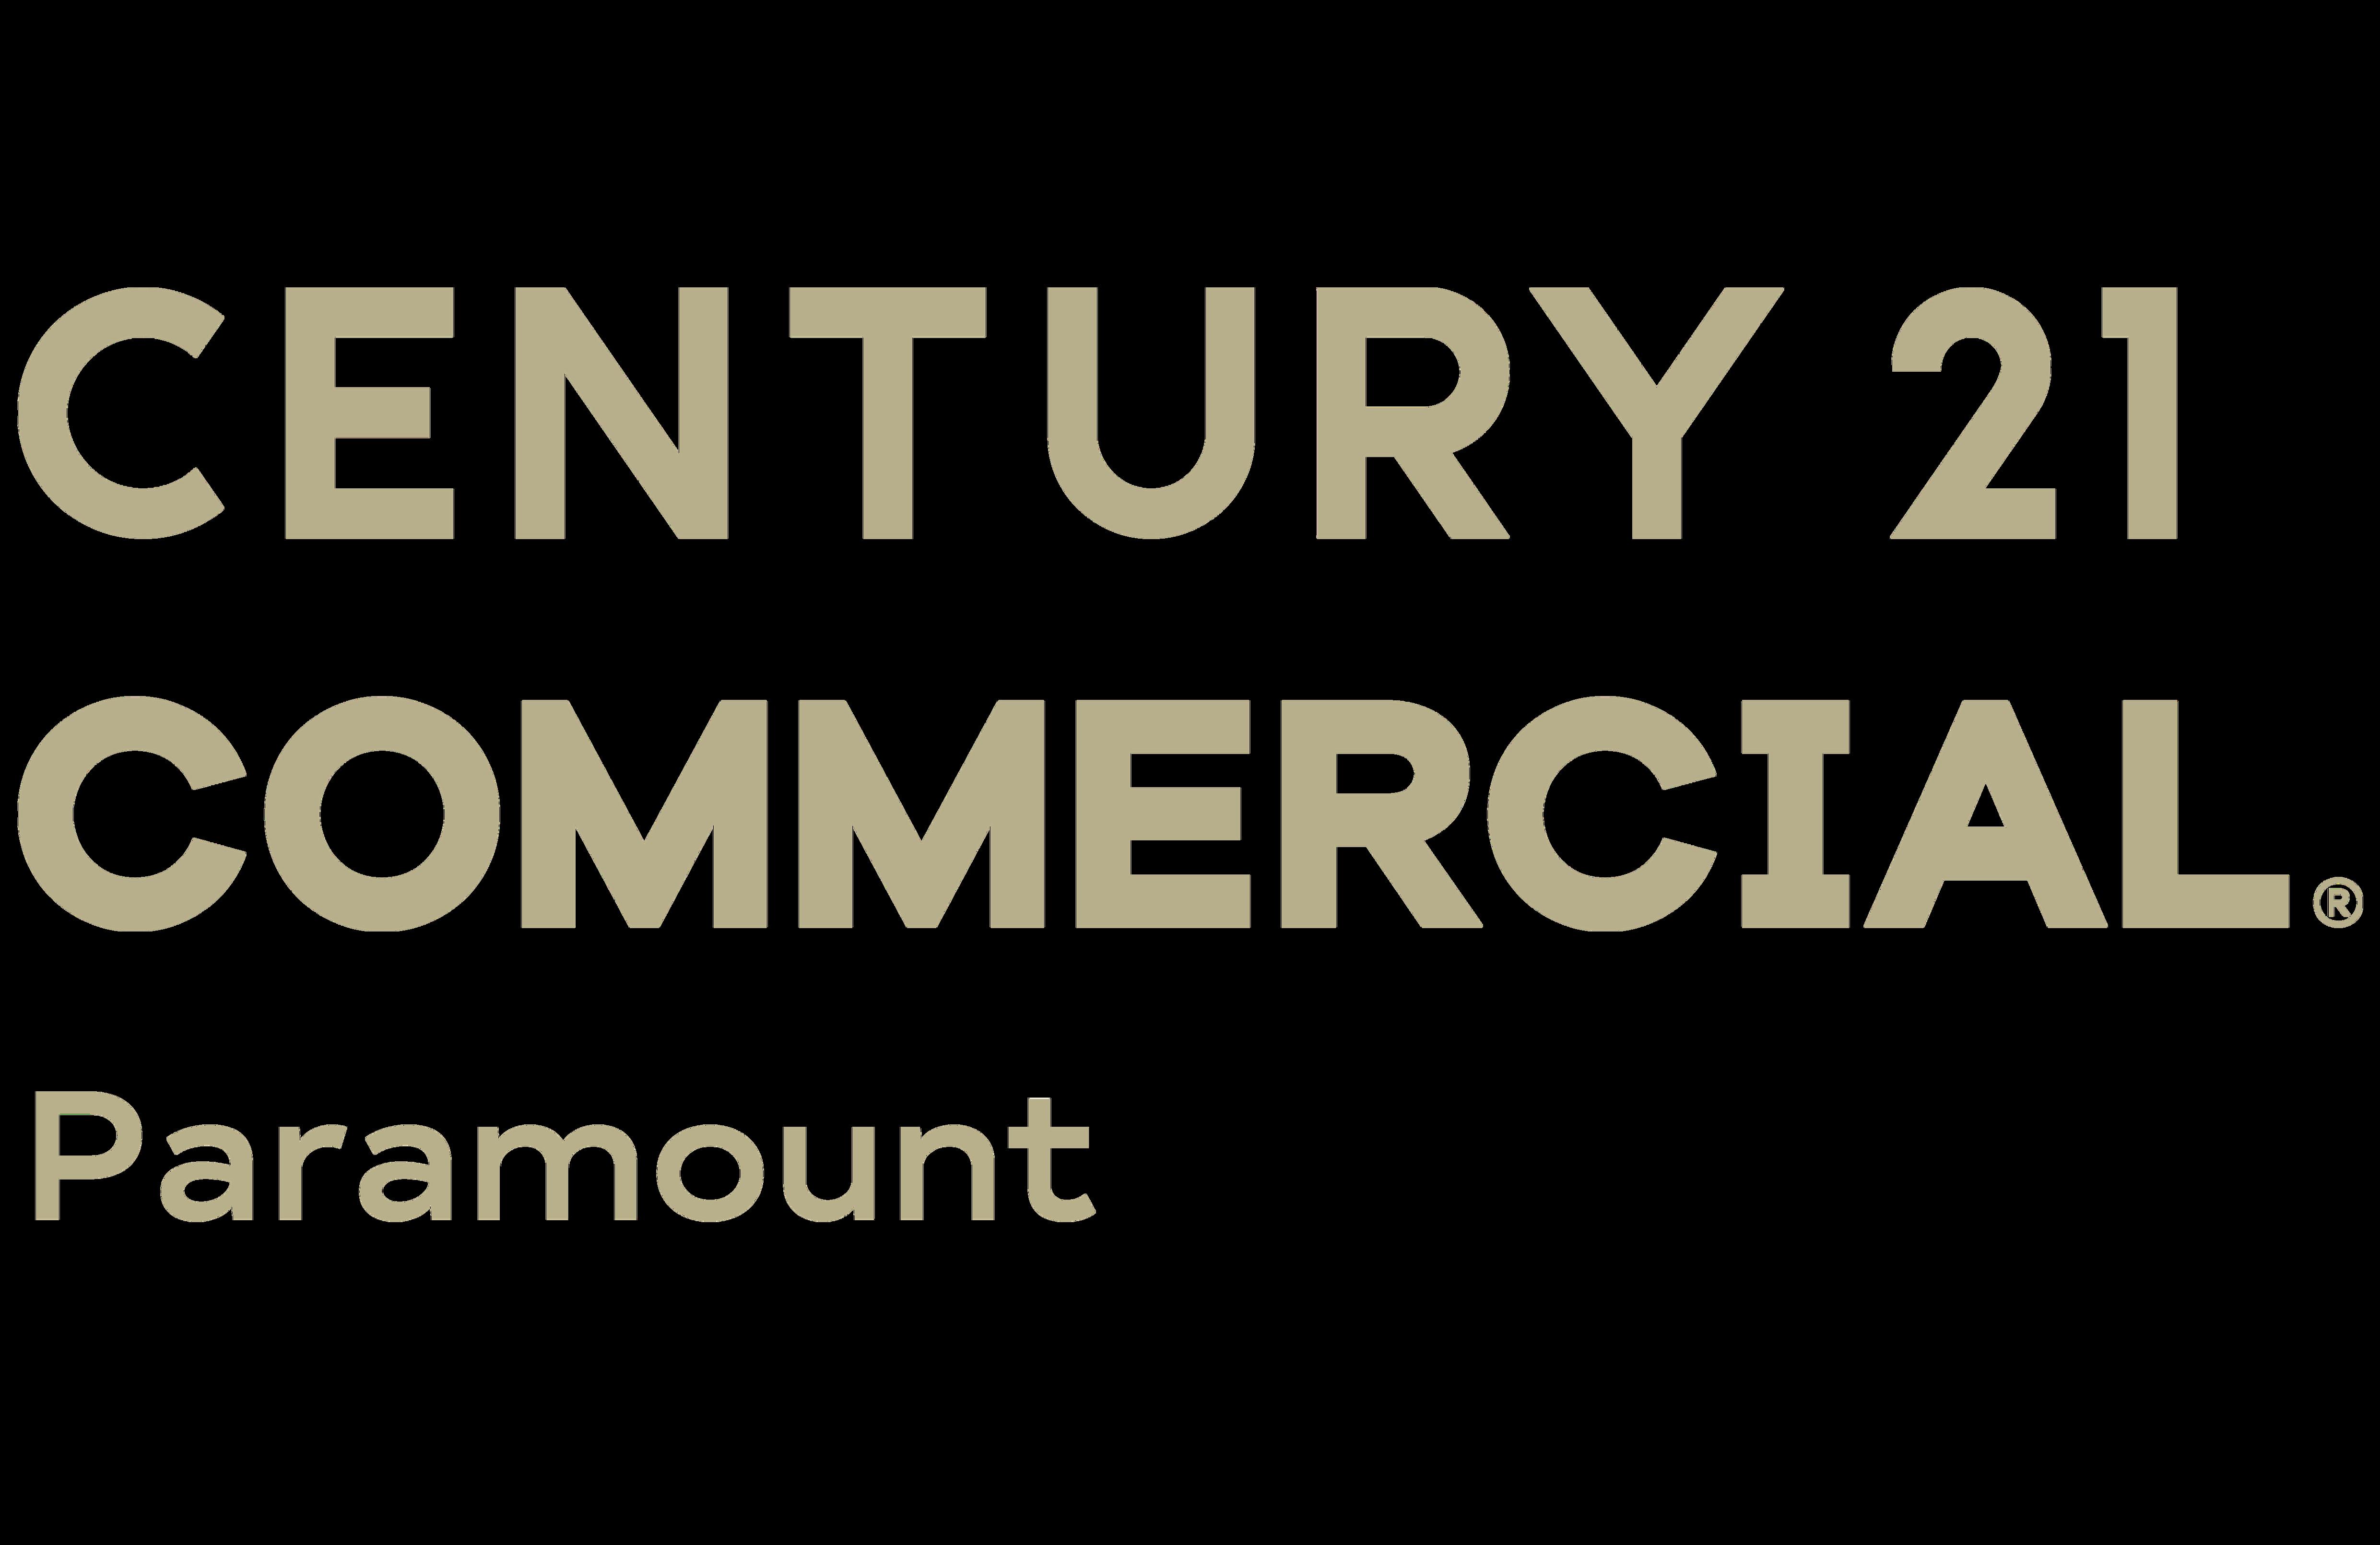 CENTURY 21 Paramount